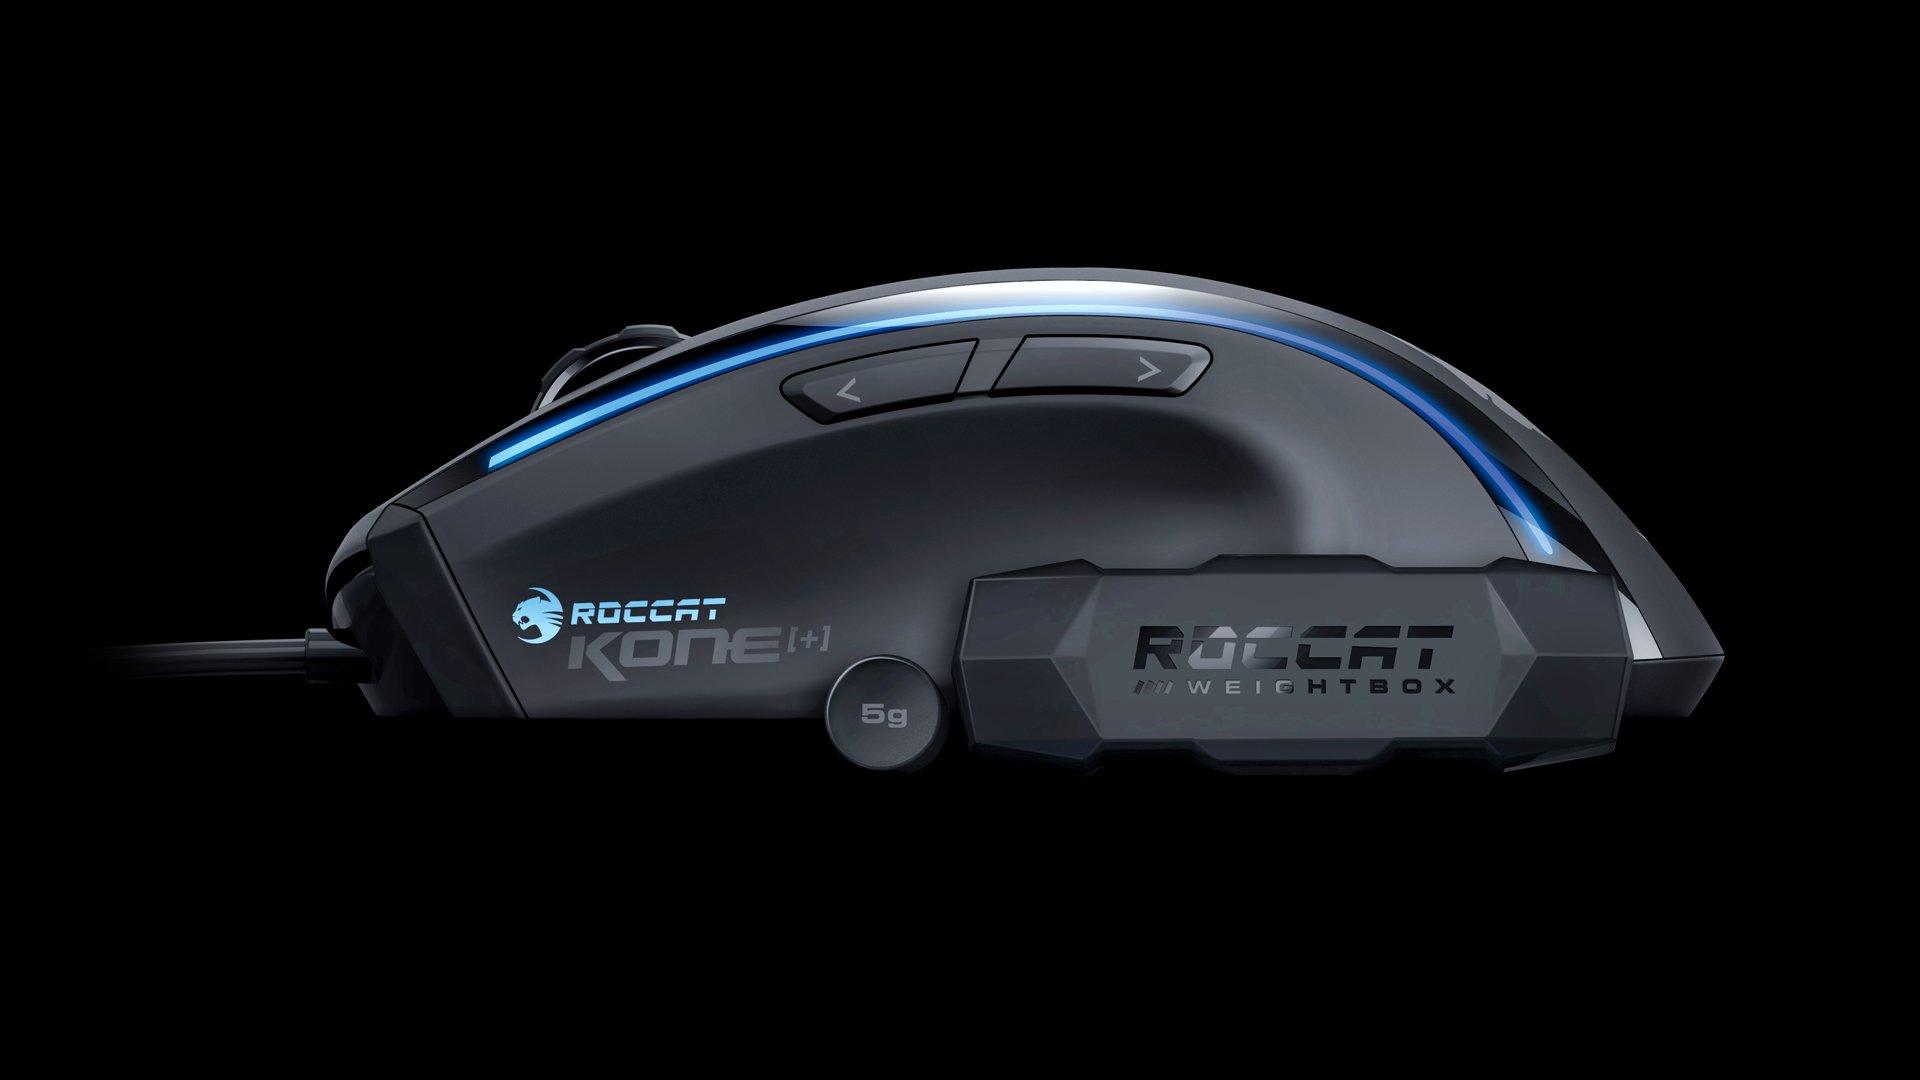 download roccat logo wallpaper - photo #41